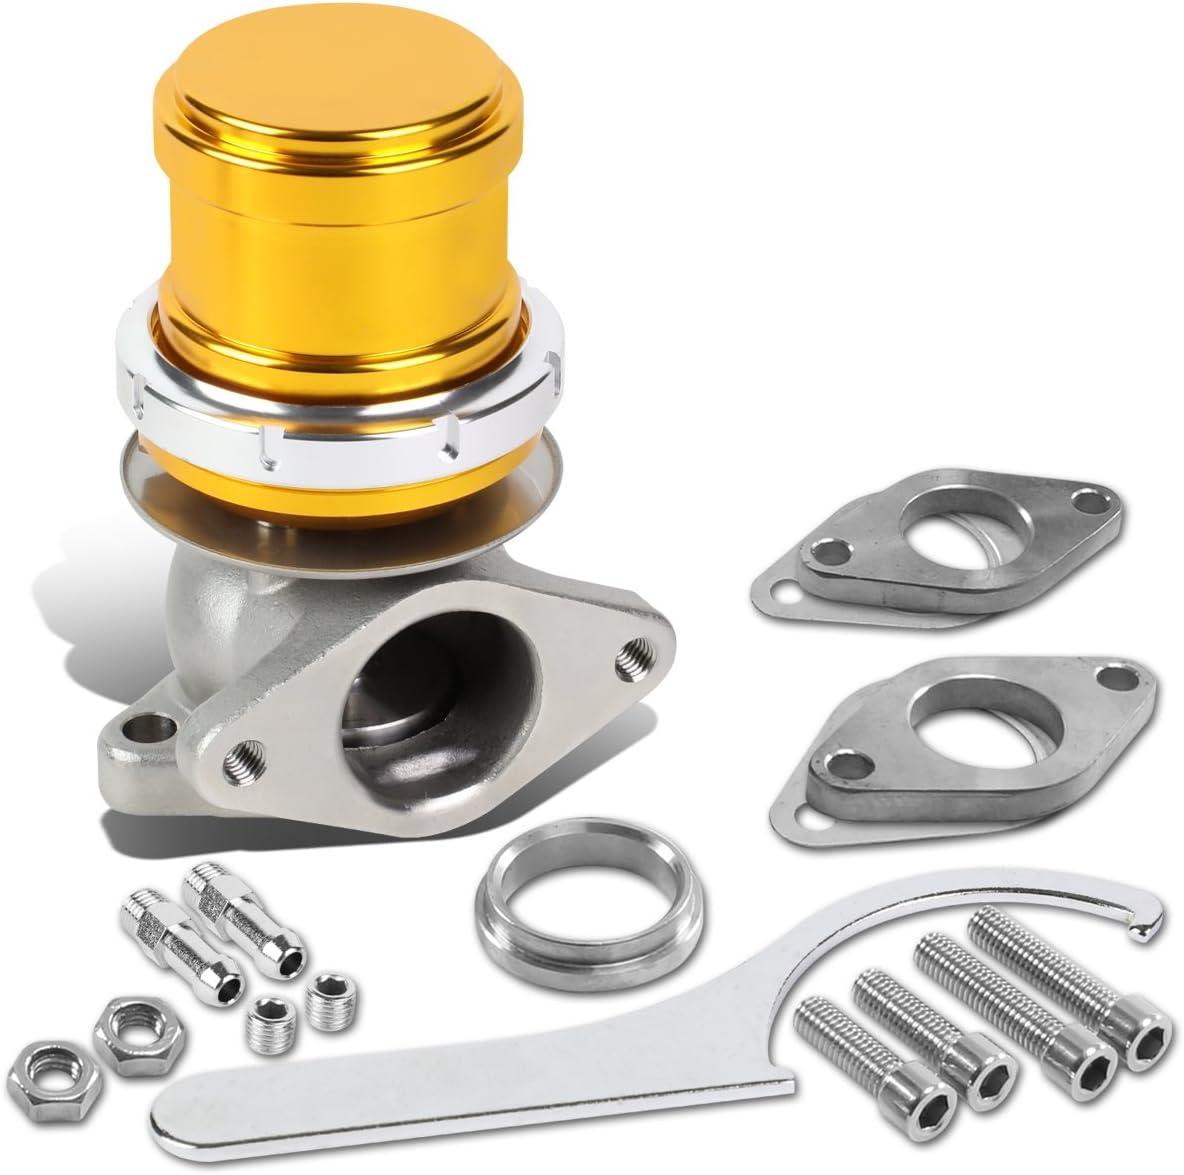 DNA Motoring WG-TS-38MM-T33-GD Our shop most popular Outlet SALE External Turbo Manifold Wastegate